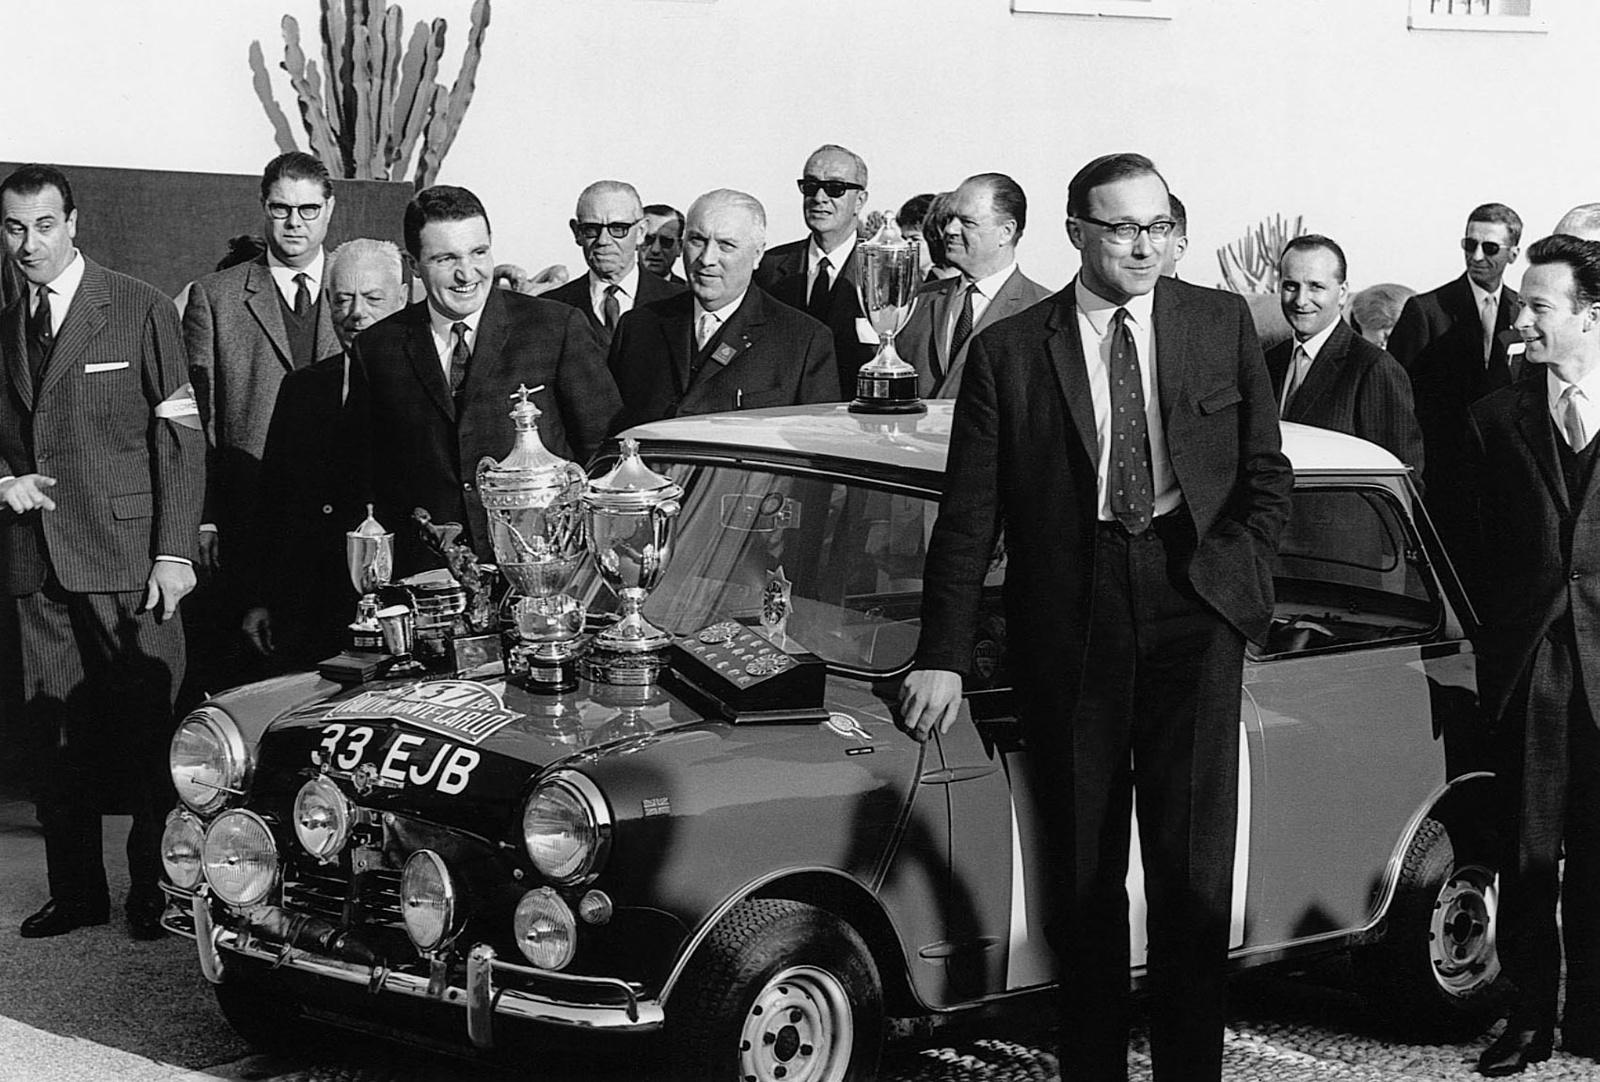 In urma cu 50 de ani MINI si Paddy Hopkirk castigau Raliul Monte-Carlo